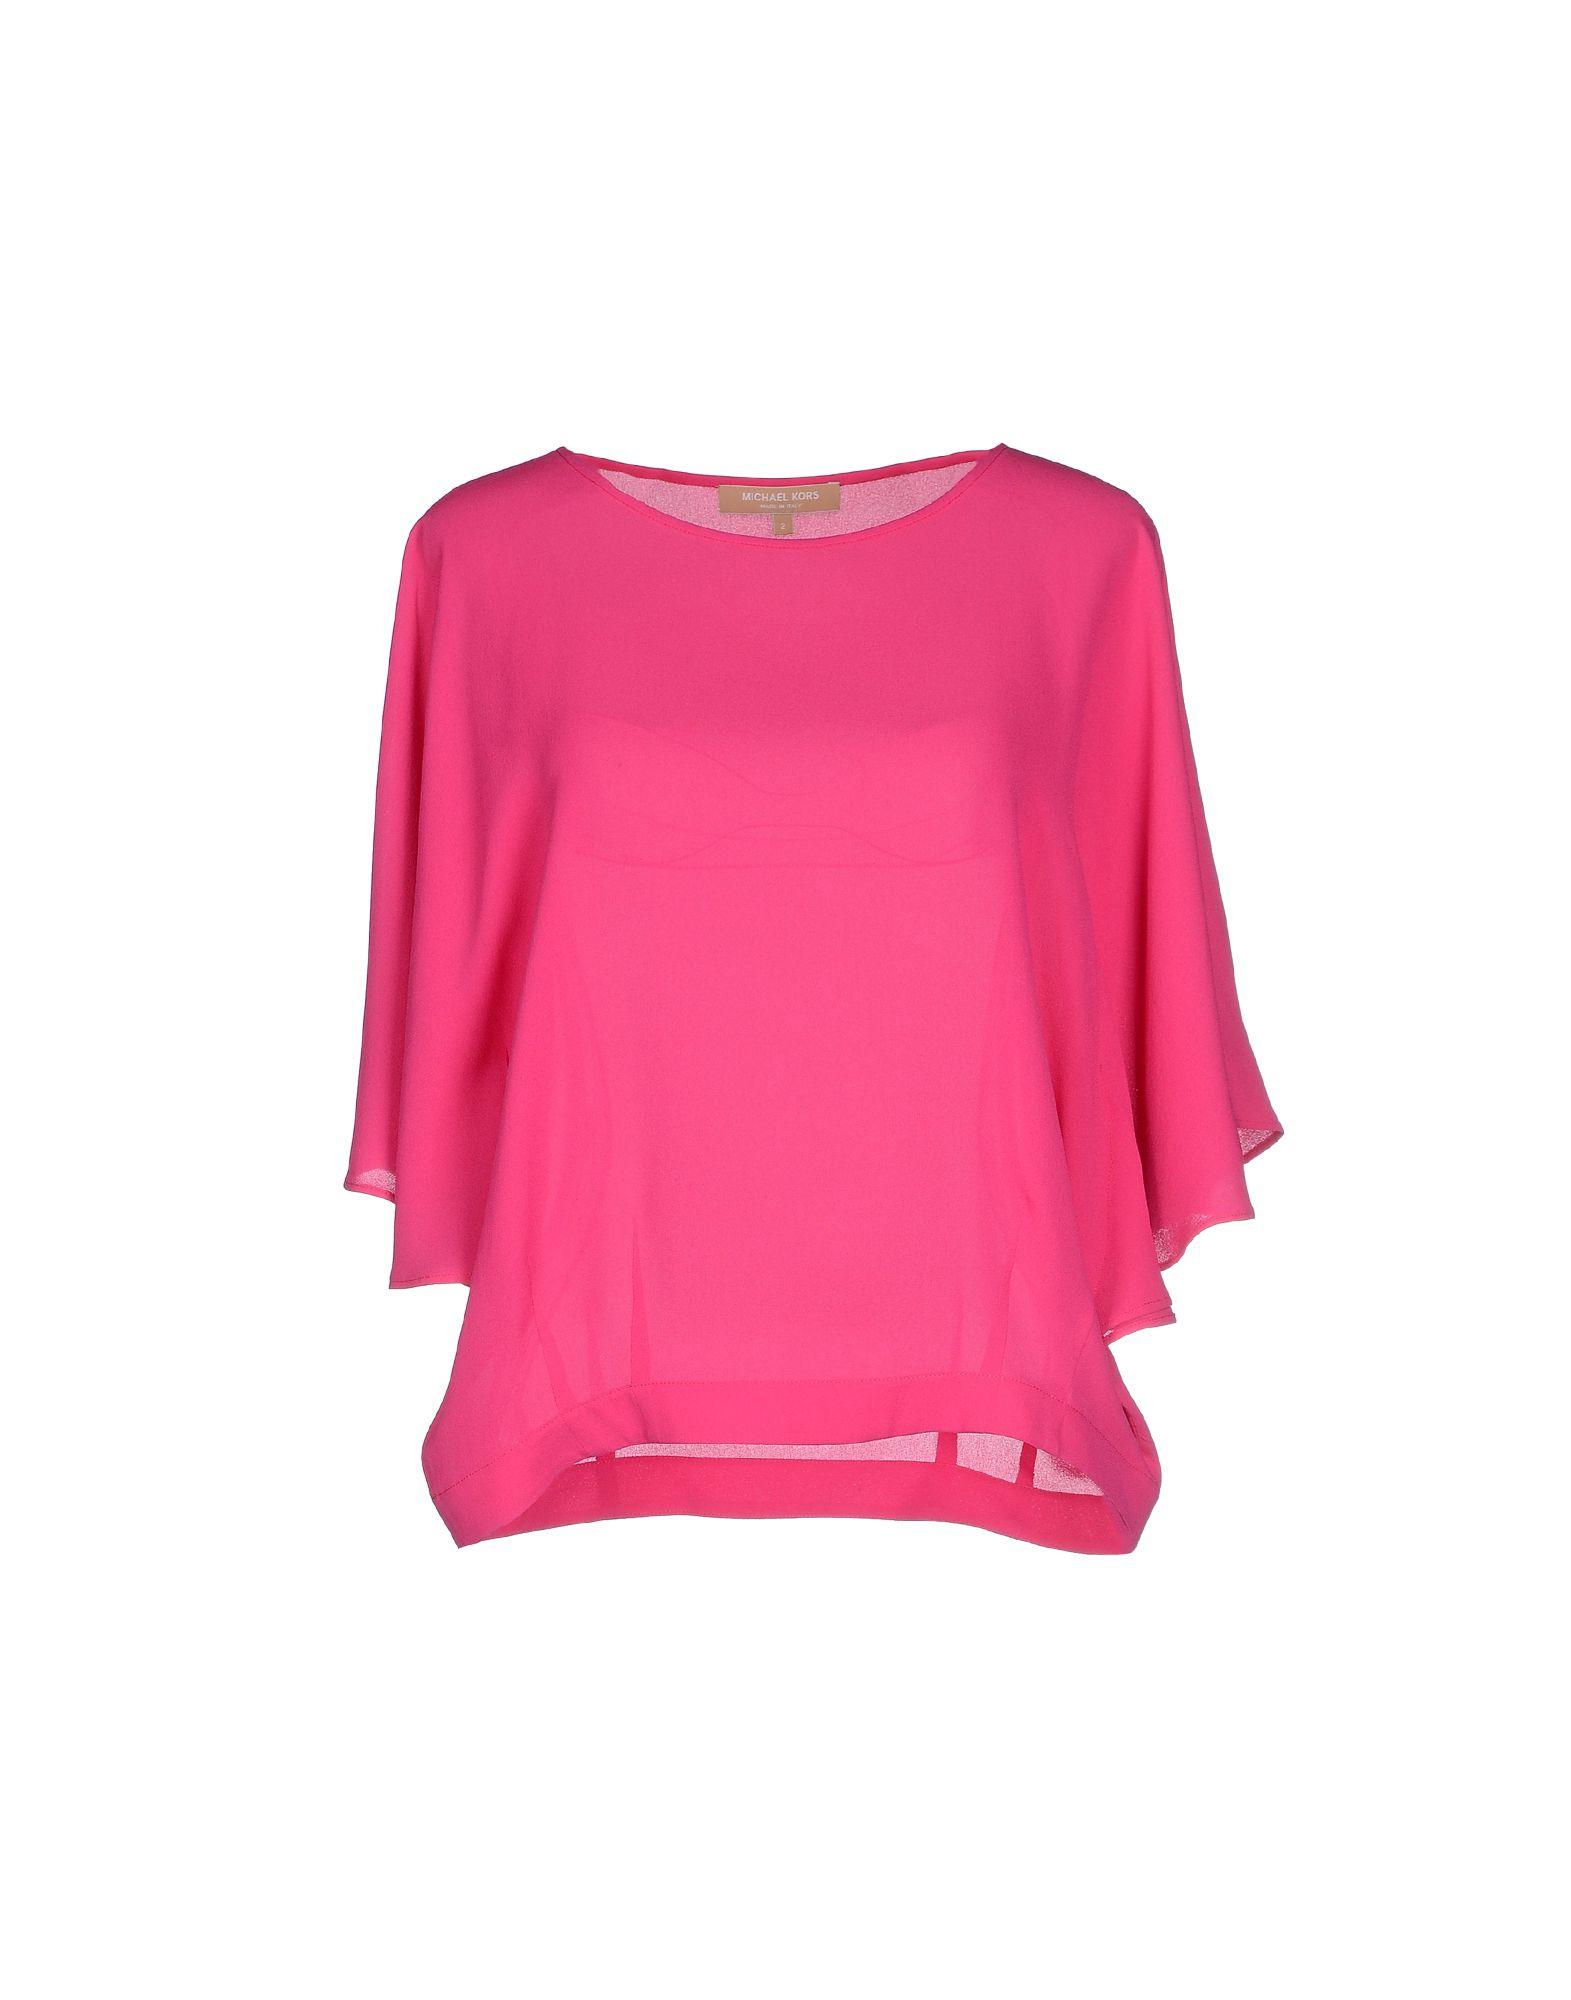 michael kors blouse in pink fuchsia lyst. Black Bedroom Furniture Sets. Home Design Ideas